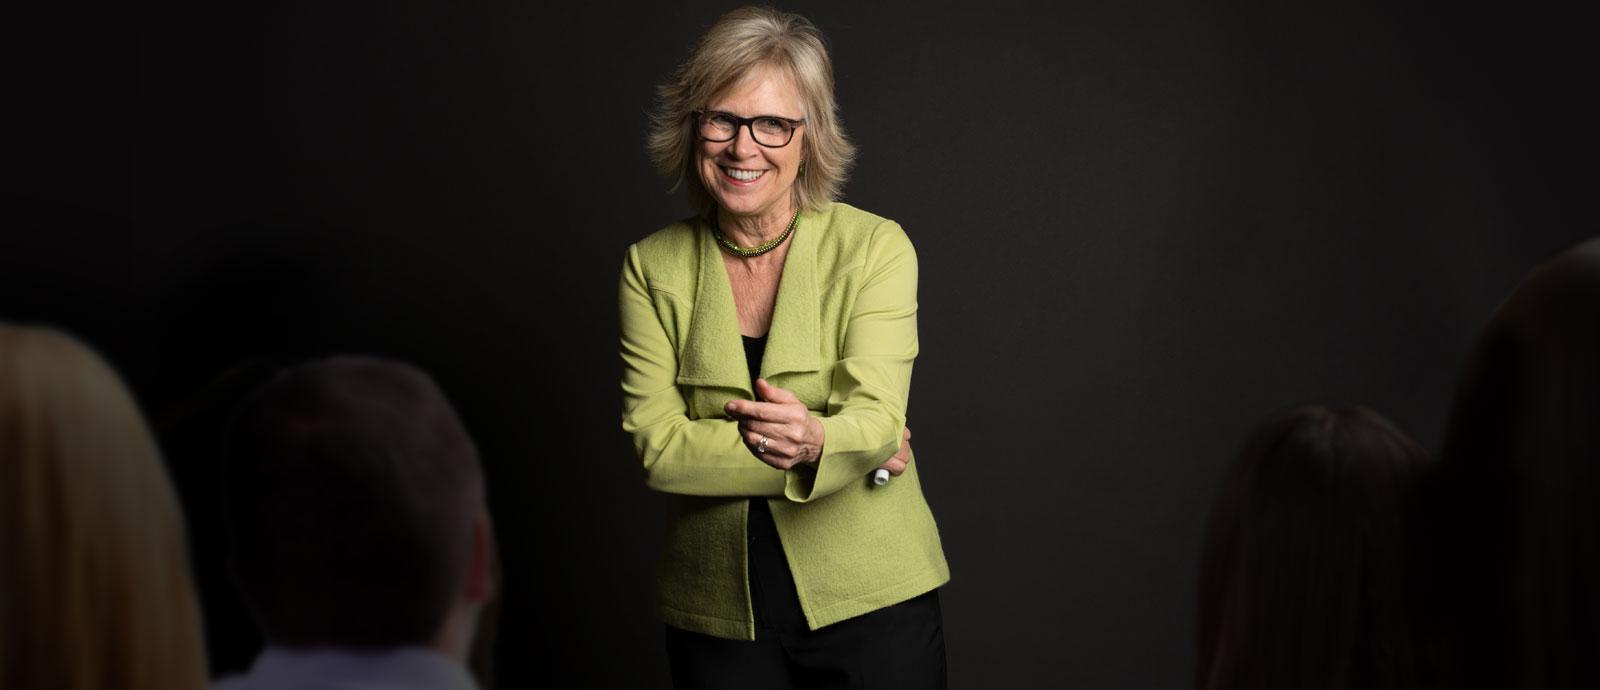 Jill Konrath speaking at a sales workshop